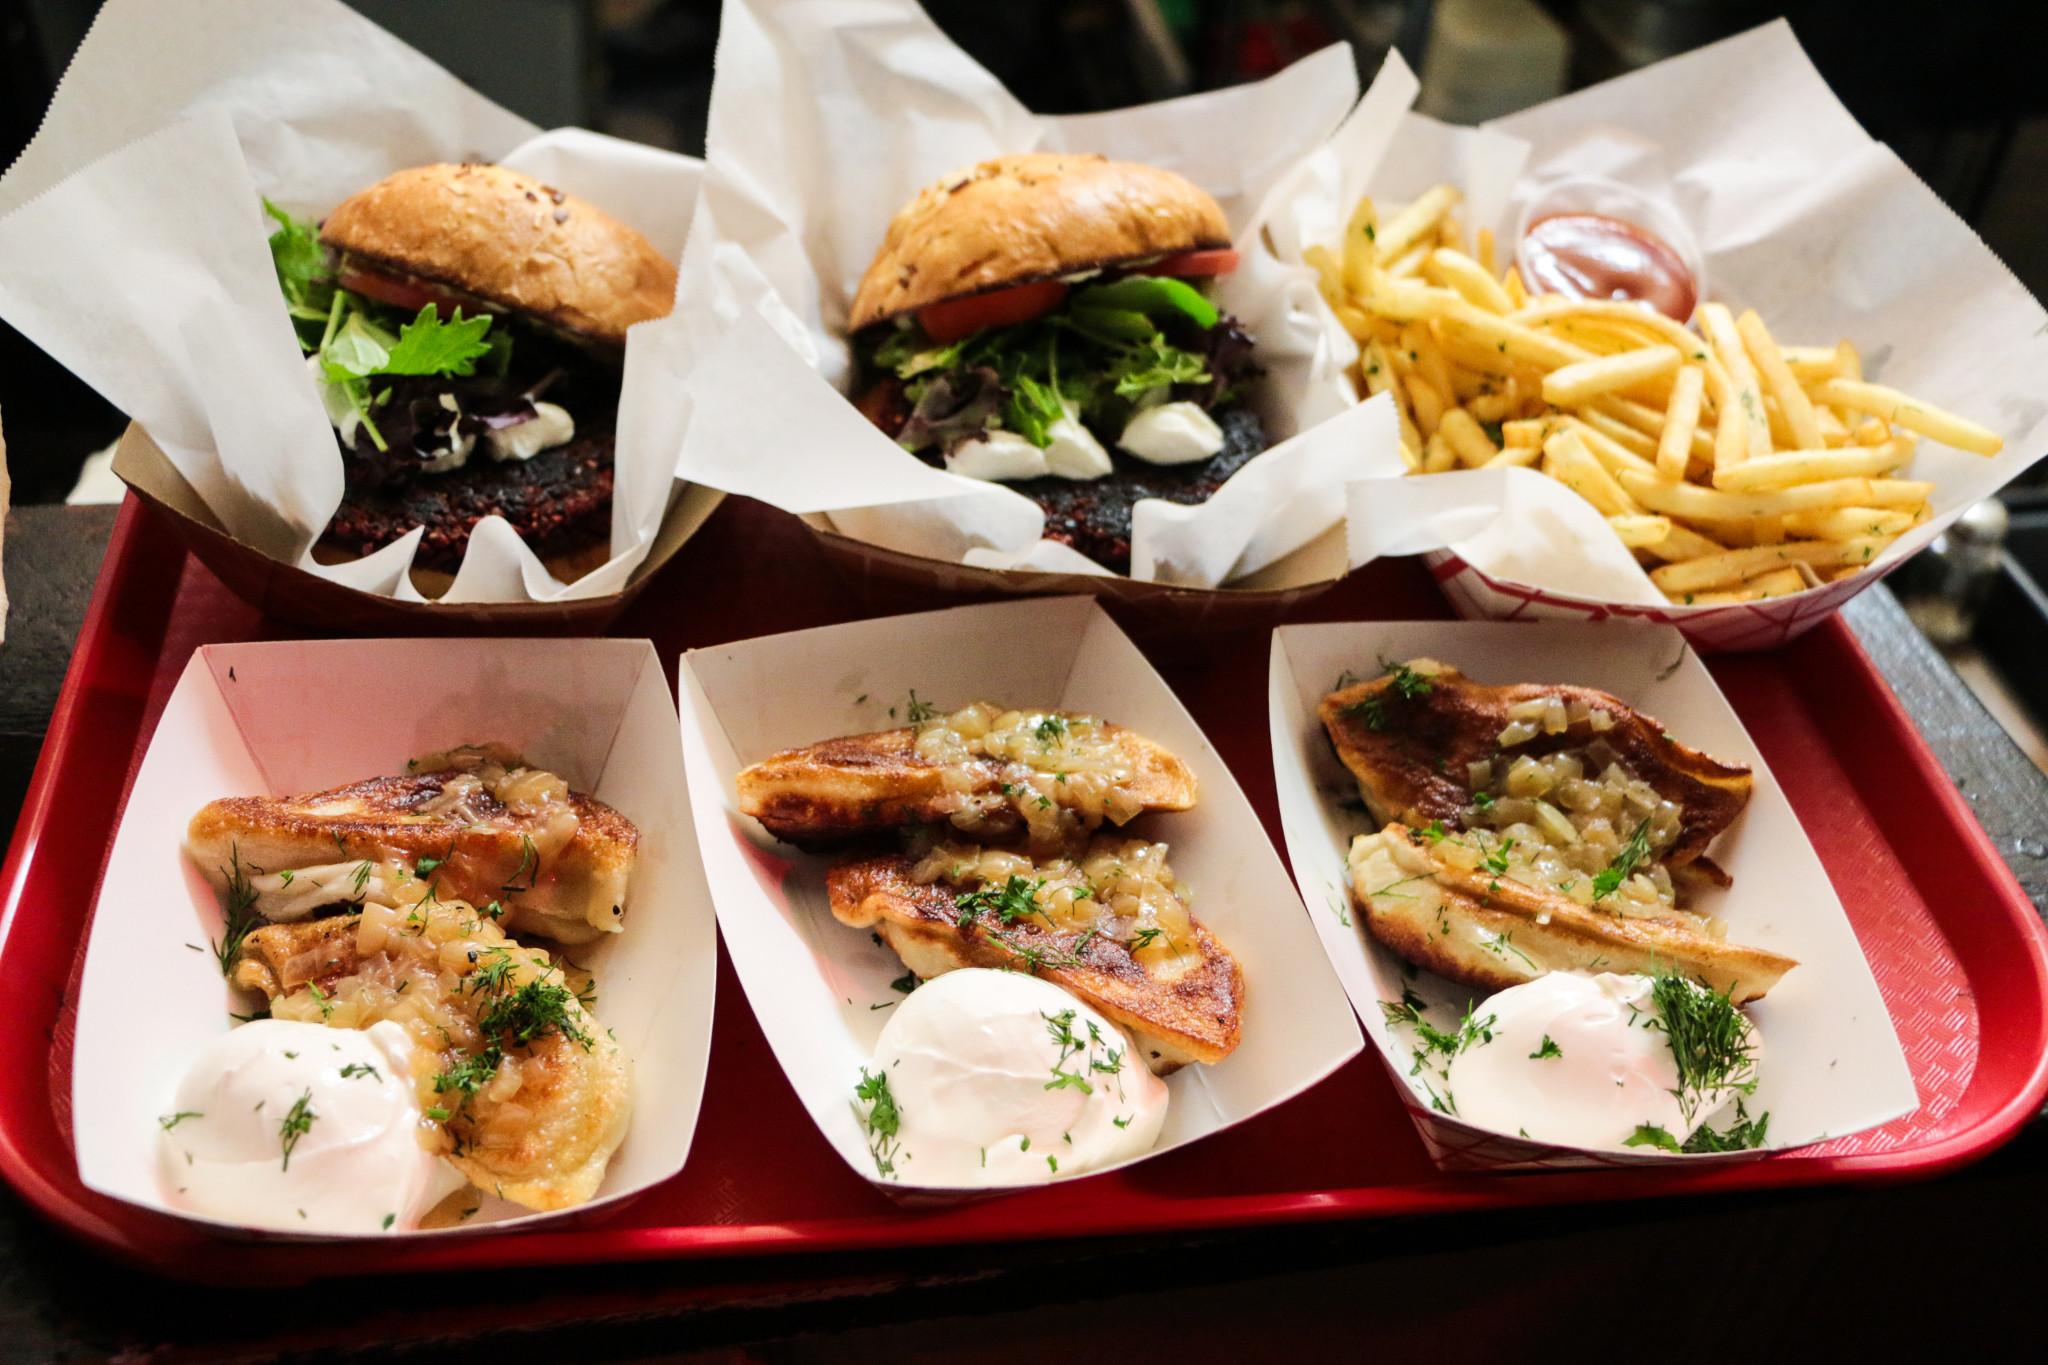 Bar food with a Ukranian twist at KUKHNYA. (Photo: Rebecca Ratliff)